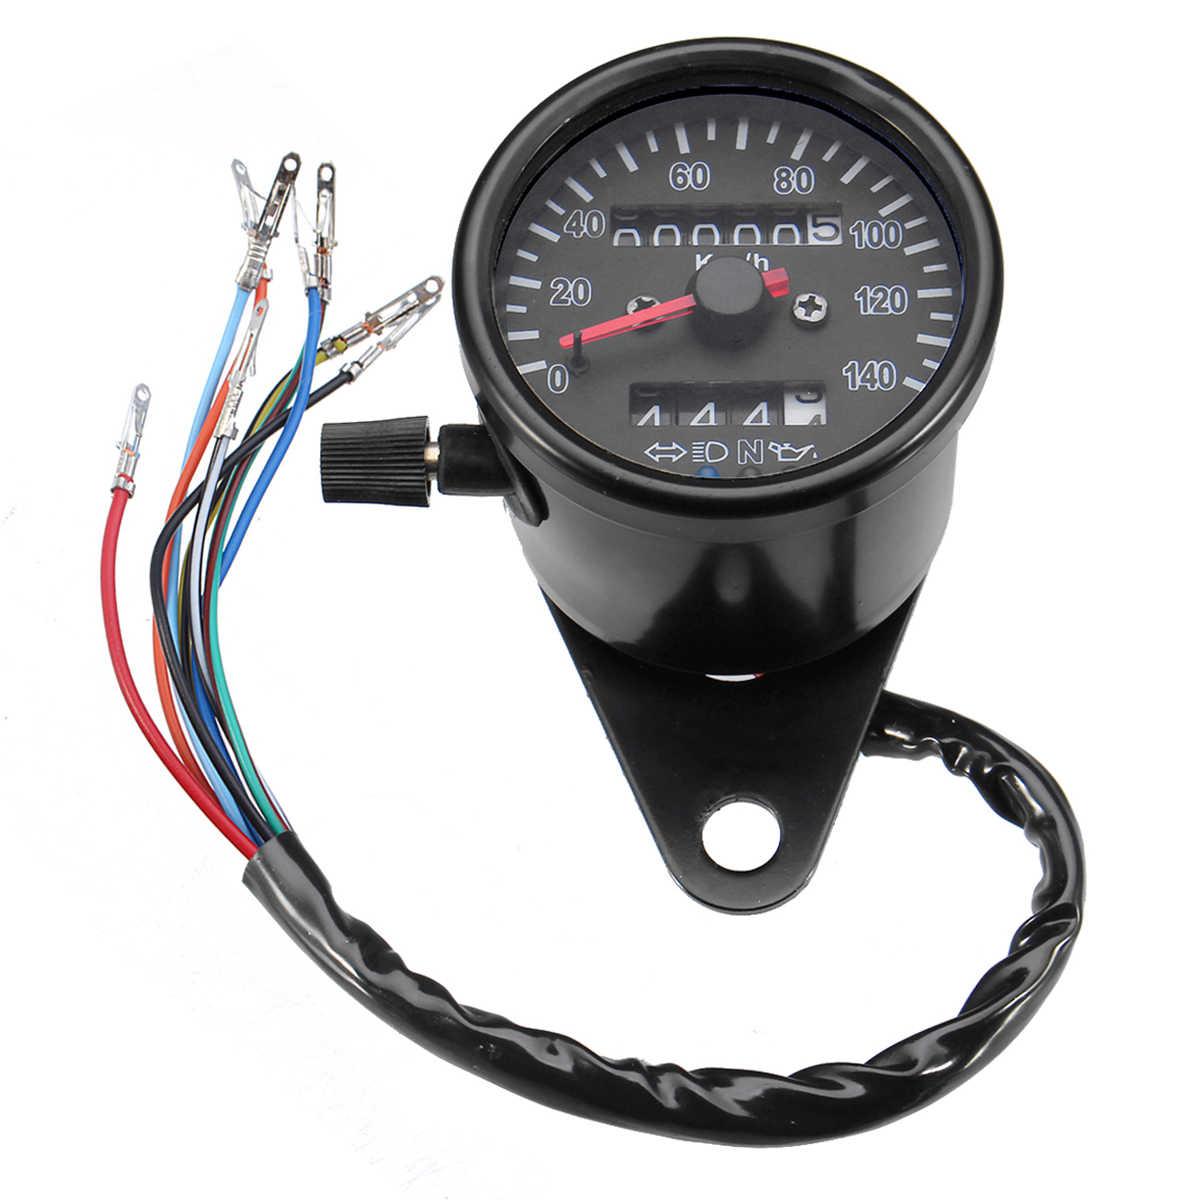 12V Motorcycle Retro Odometer Speedmeter Gauge with LED Indicator Turn  Signal Light Headlamps Neutral Gear Oil Warning Light